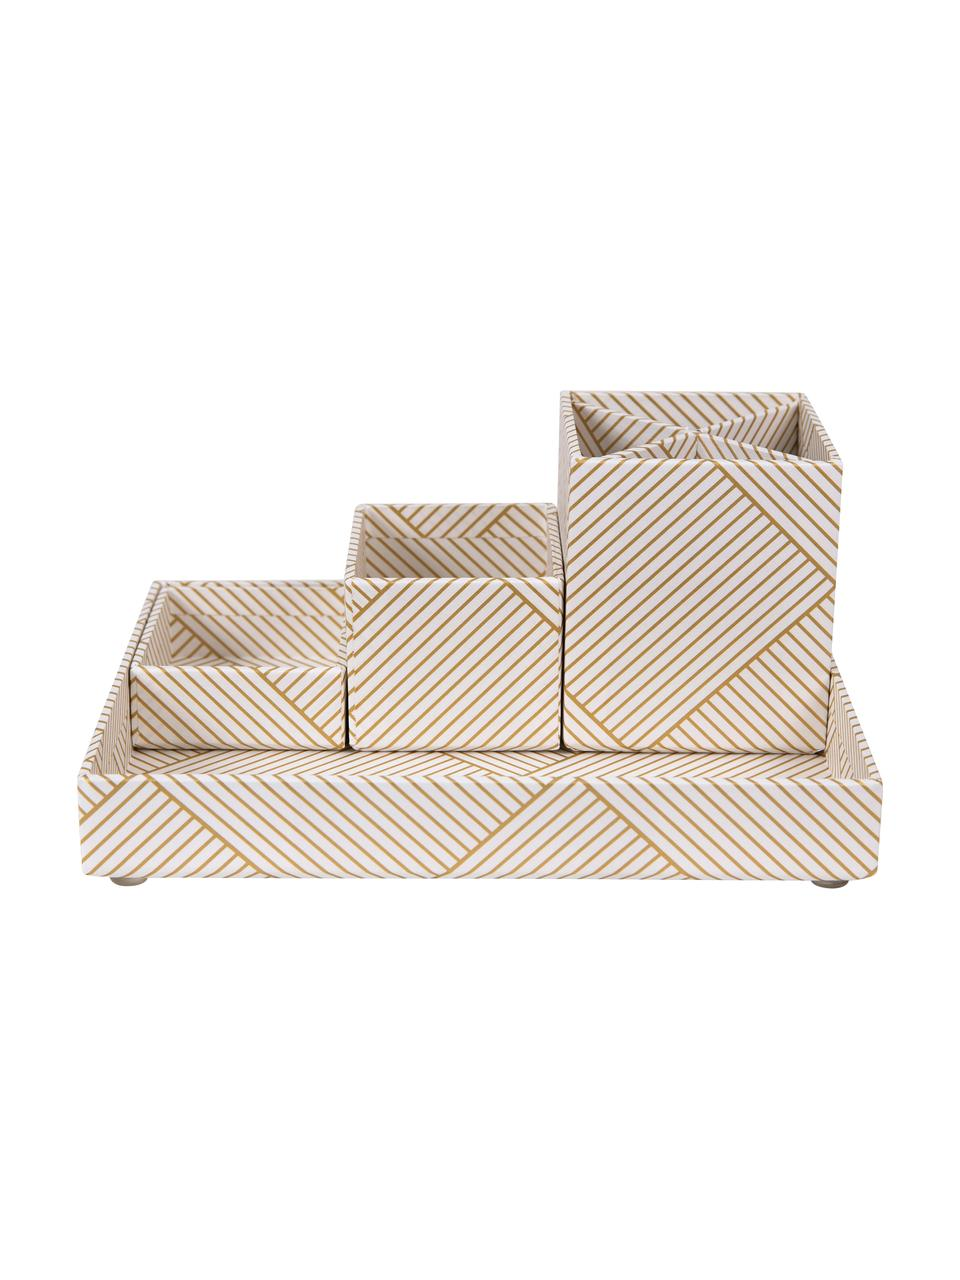 Büro-Organizer-Set Lena, 4-tlg., Fester, laminierter Karton, Goldfarben, Weiß, Sondergrößen